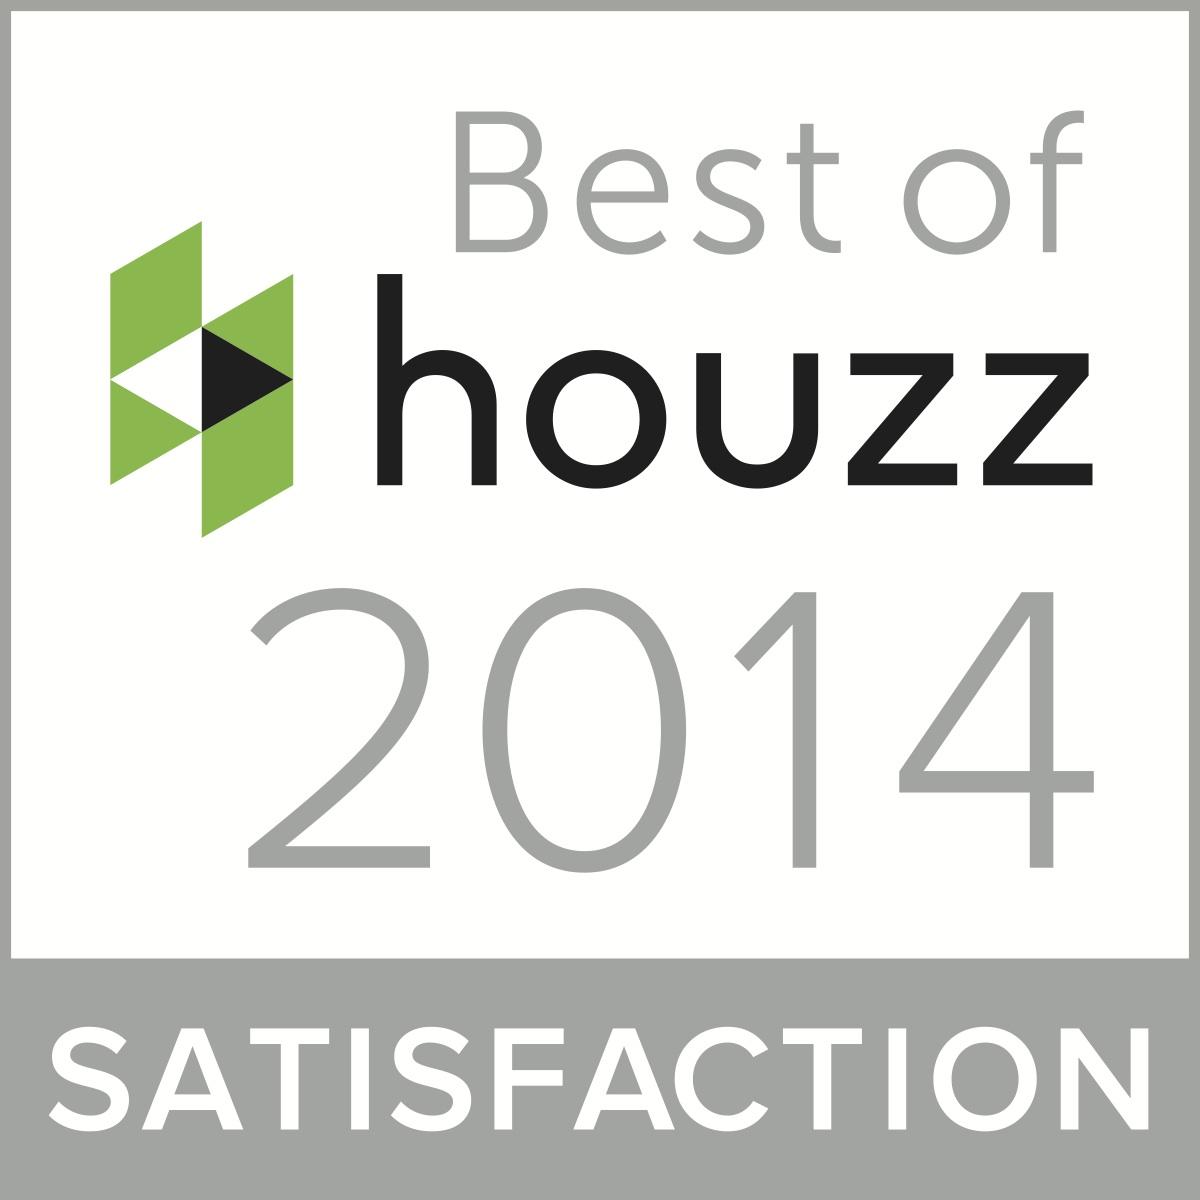 best of houzz badge 2014 award